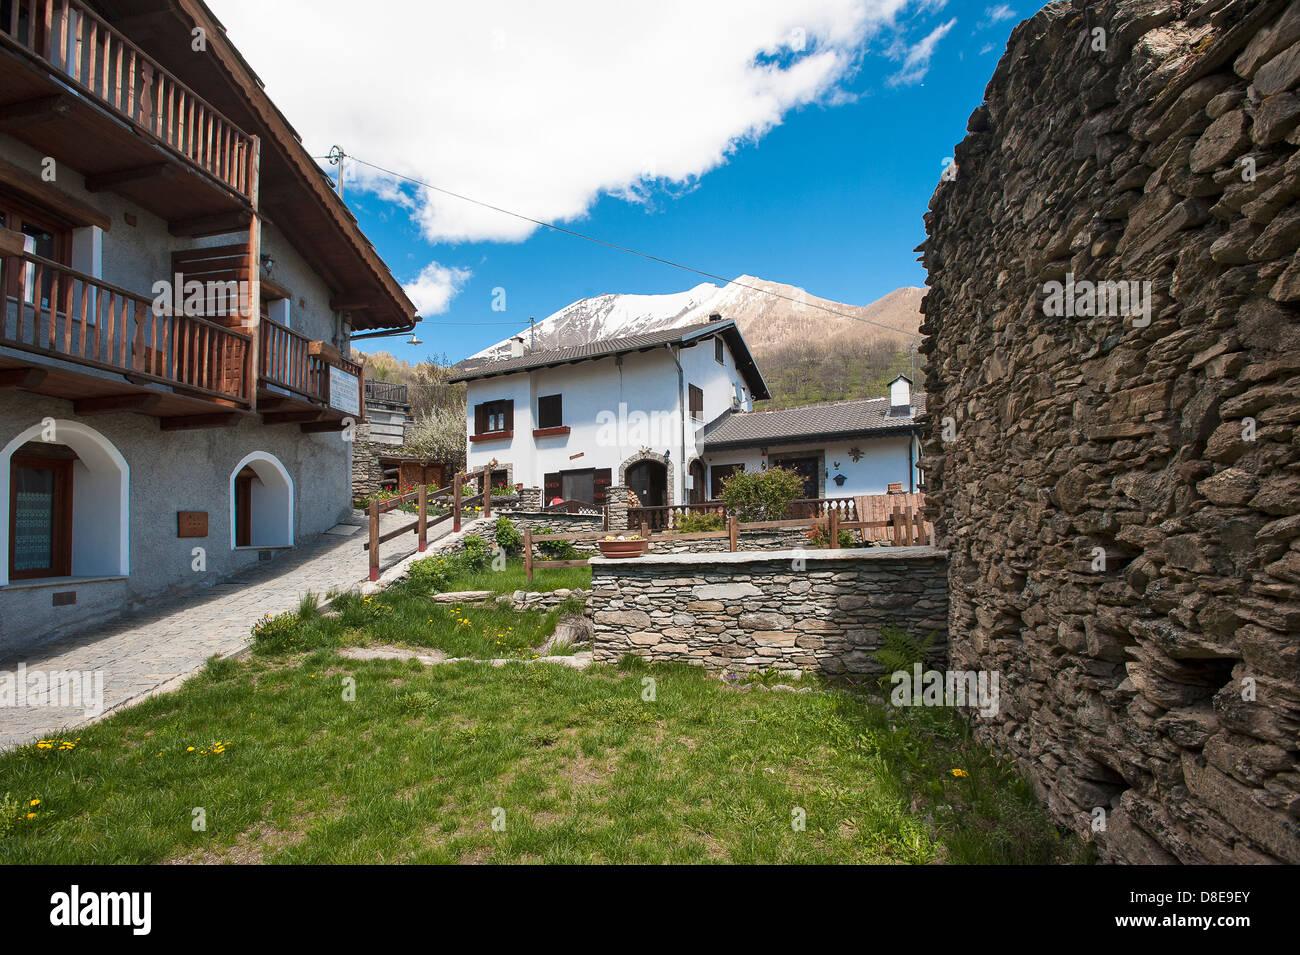 Europe Italy Province of Torino Piedmont Orsiera Rocciavriè Park Usseaux the mountain Village - Stock Image